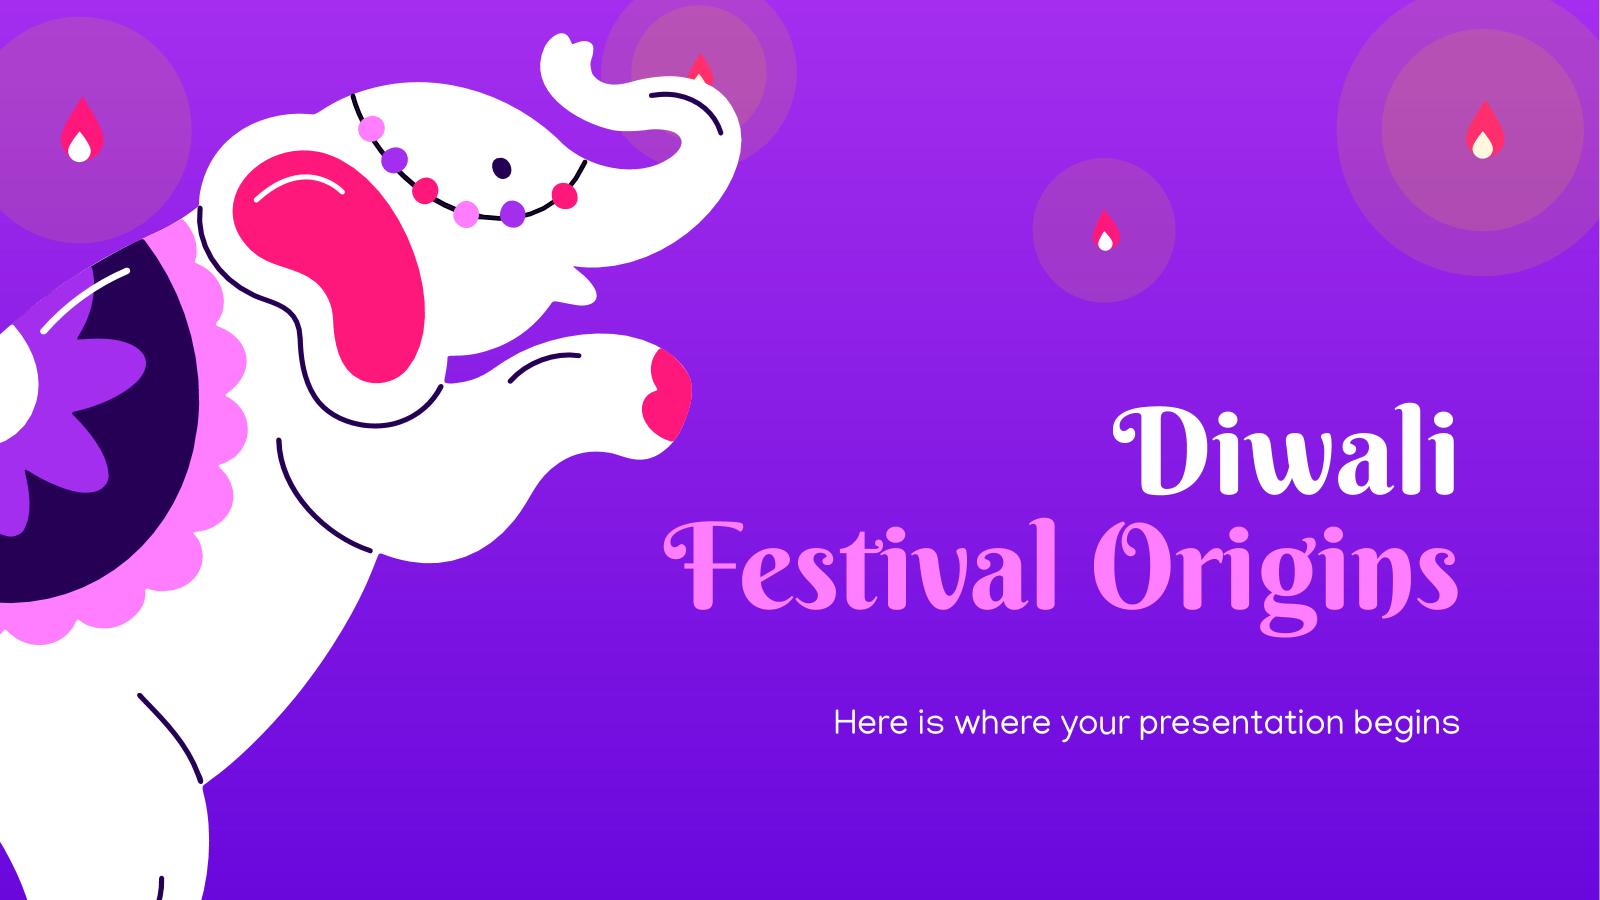 Diwali Festival Origins presentation template